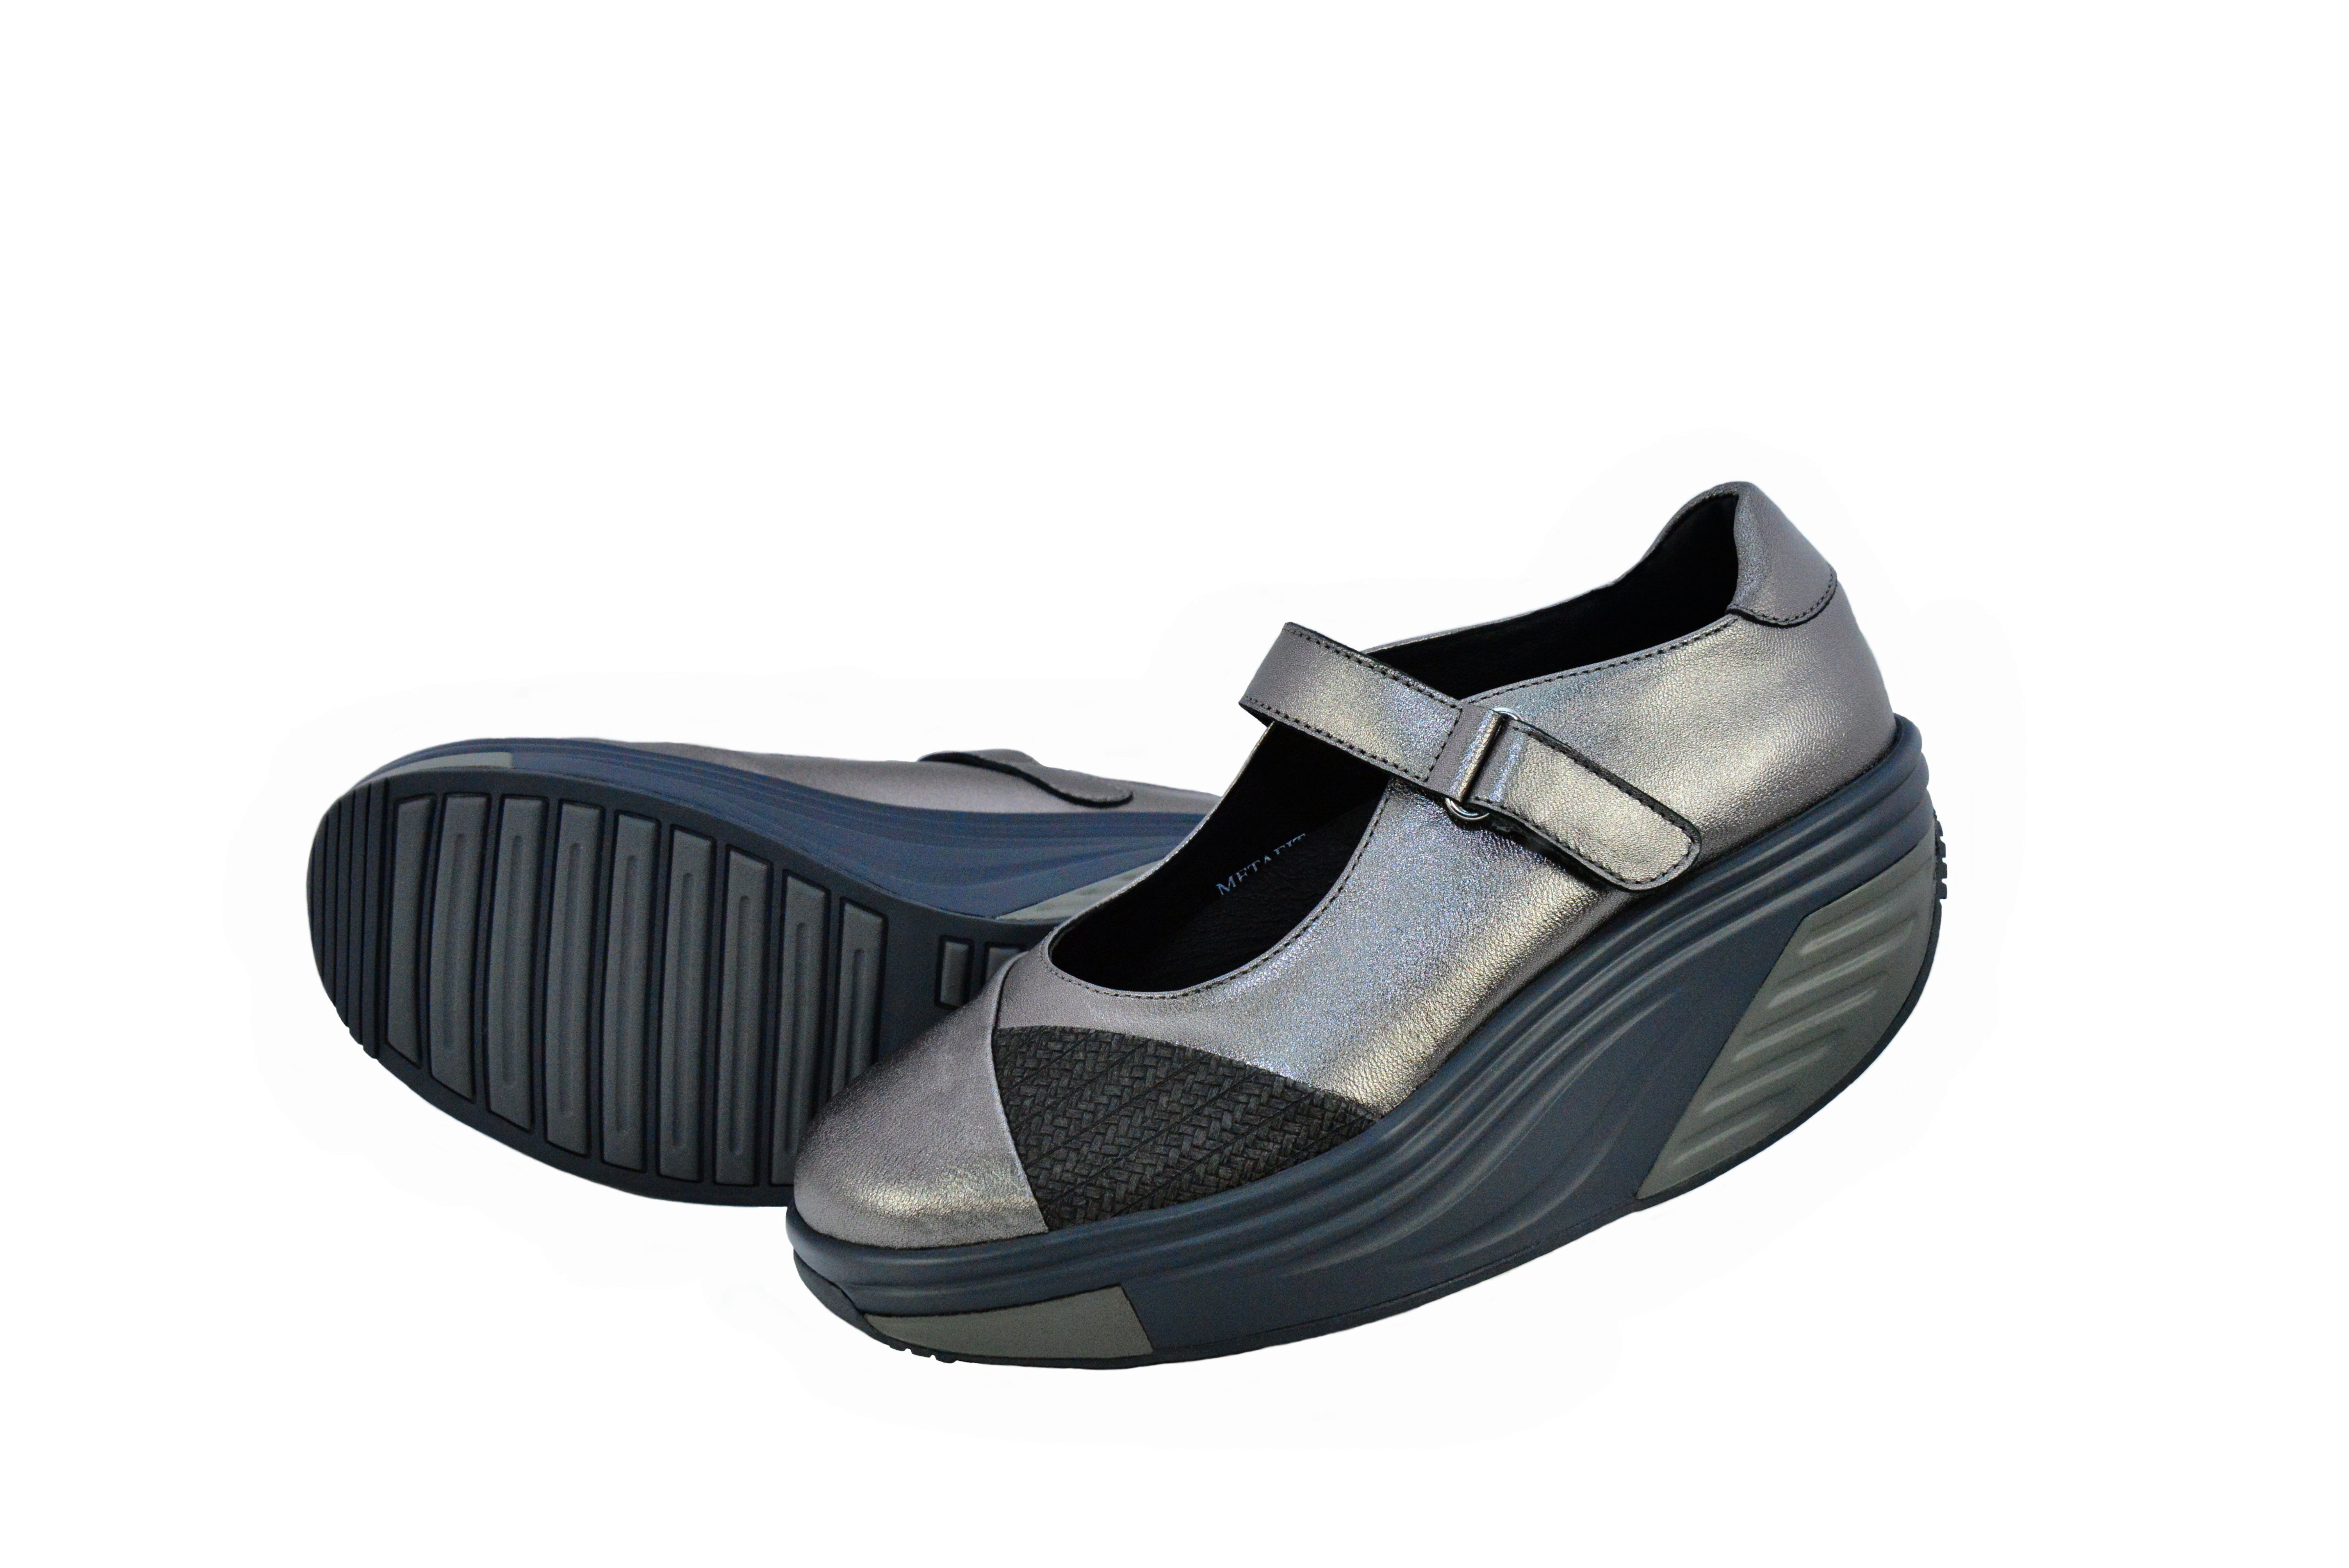 METAFIT時尚健康鞋~娃娃鞋系列~MJ8~低調灰